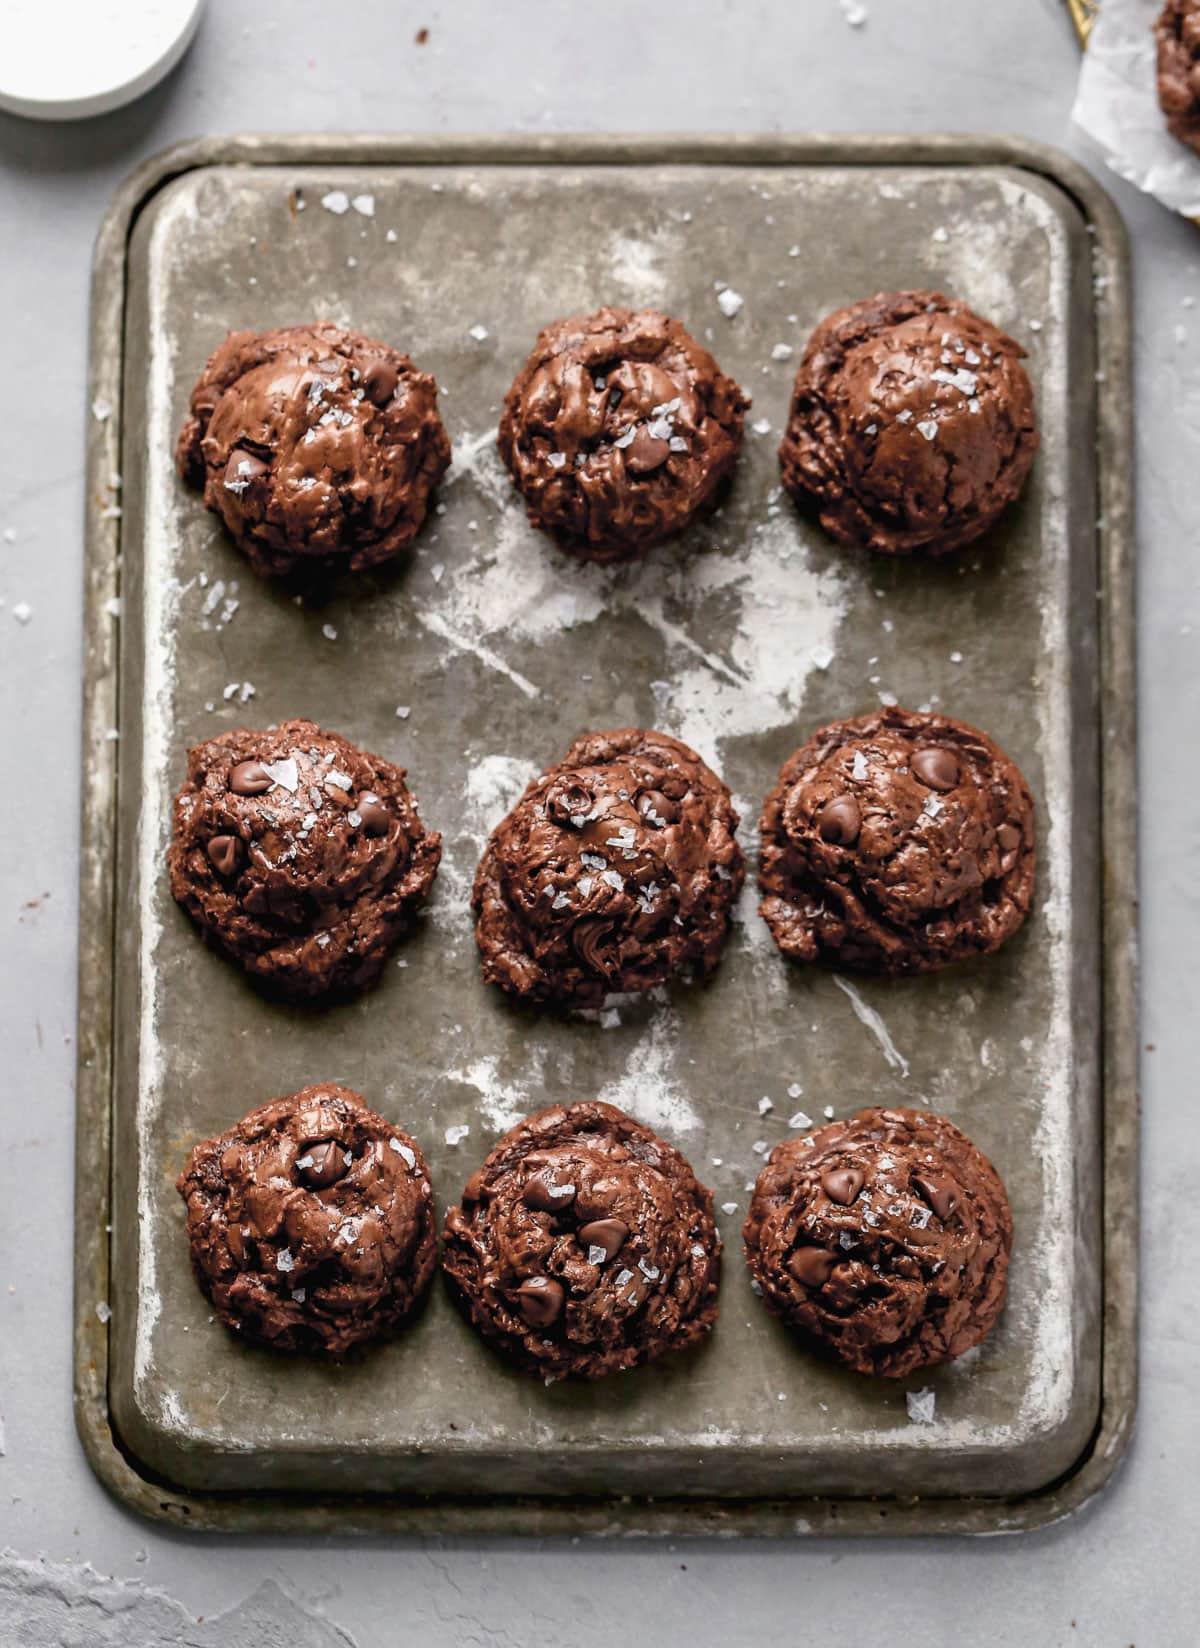 Dark chocolate cookies on a baking sheet